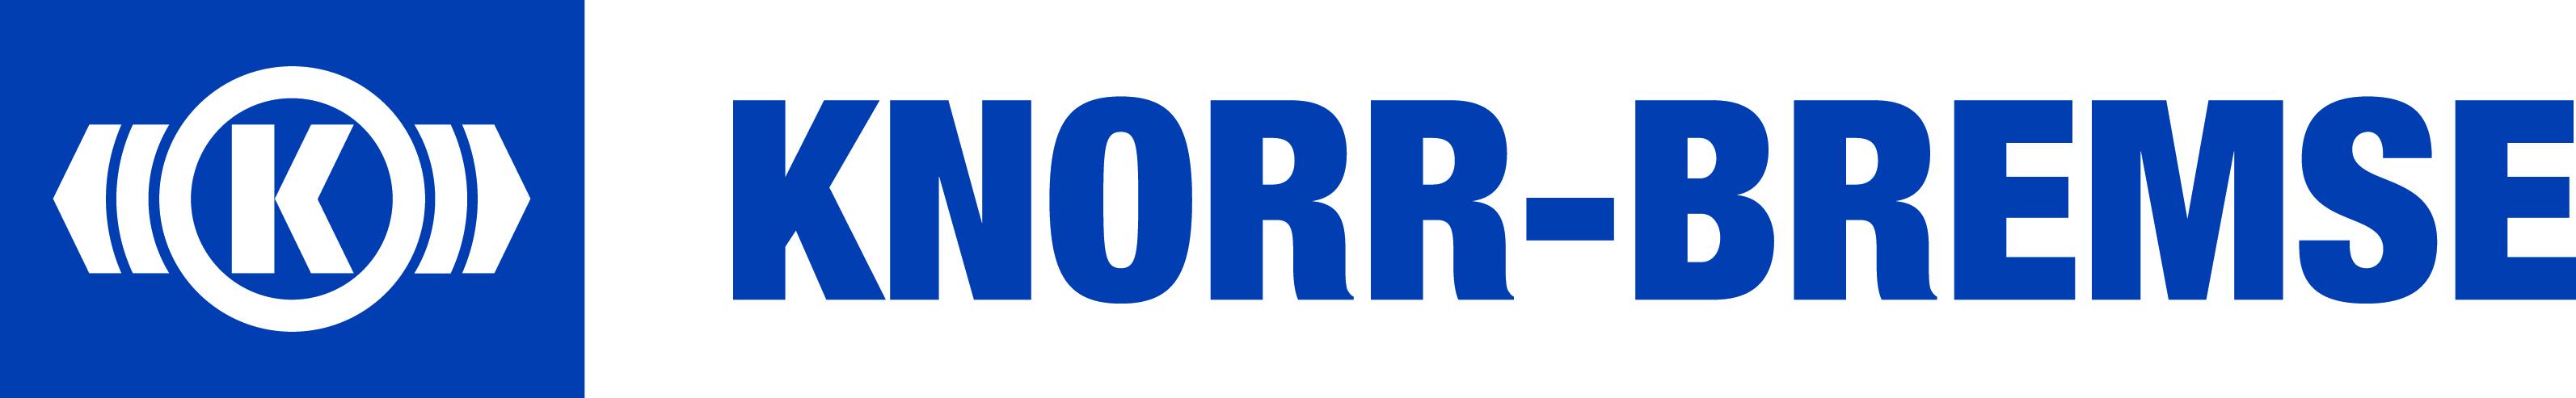 Knorr Brake Company - Westminster, MD 21157 - (410)875-0900 | ShowMeLocal.com